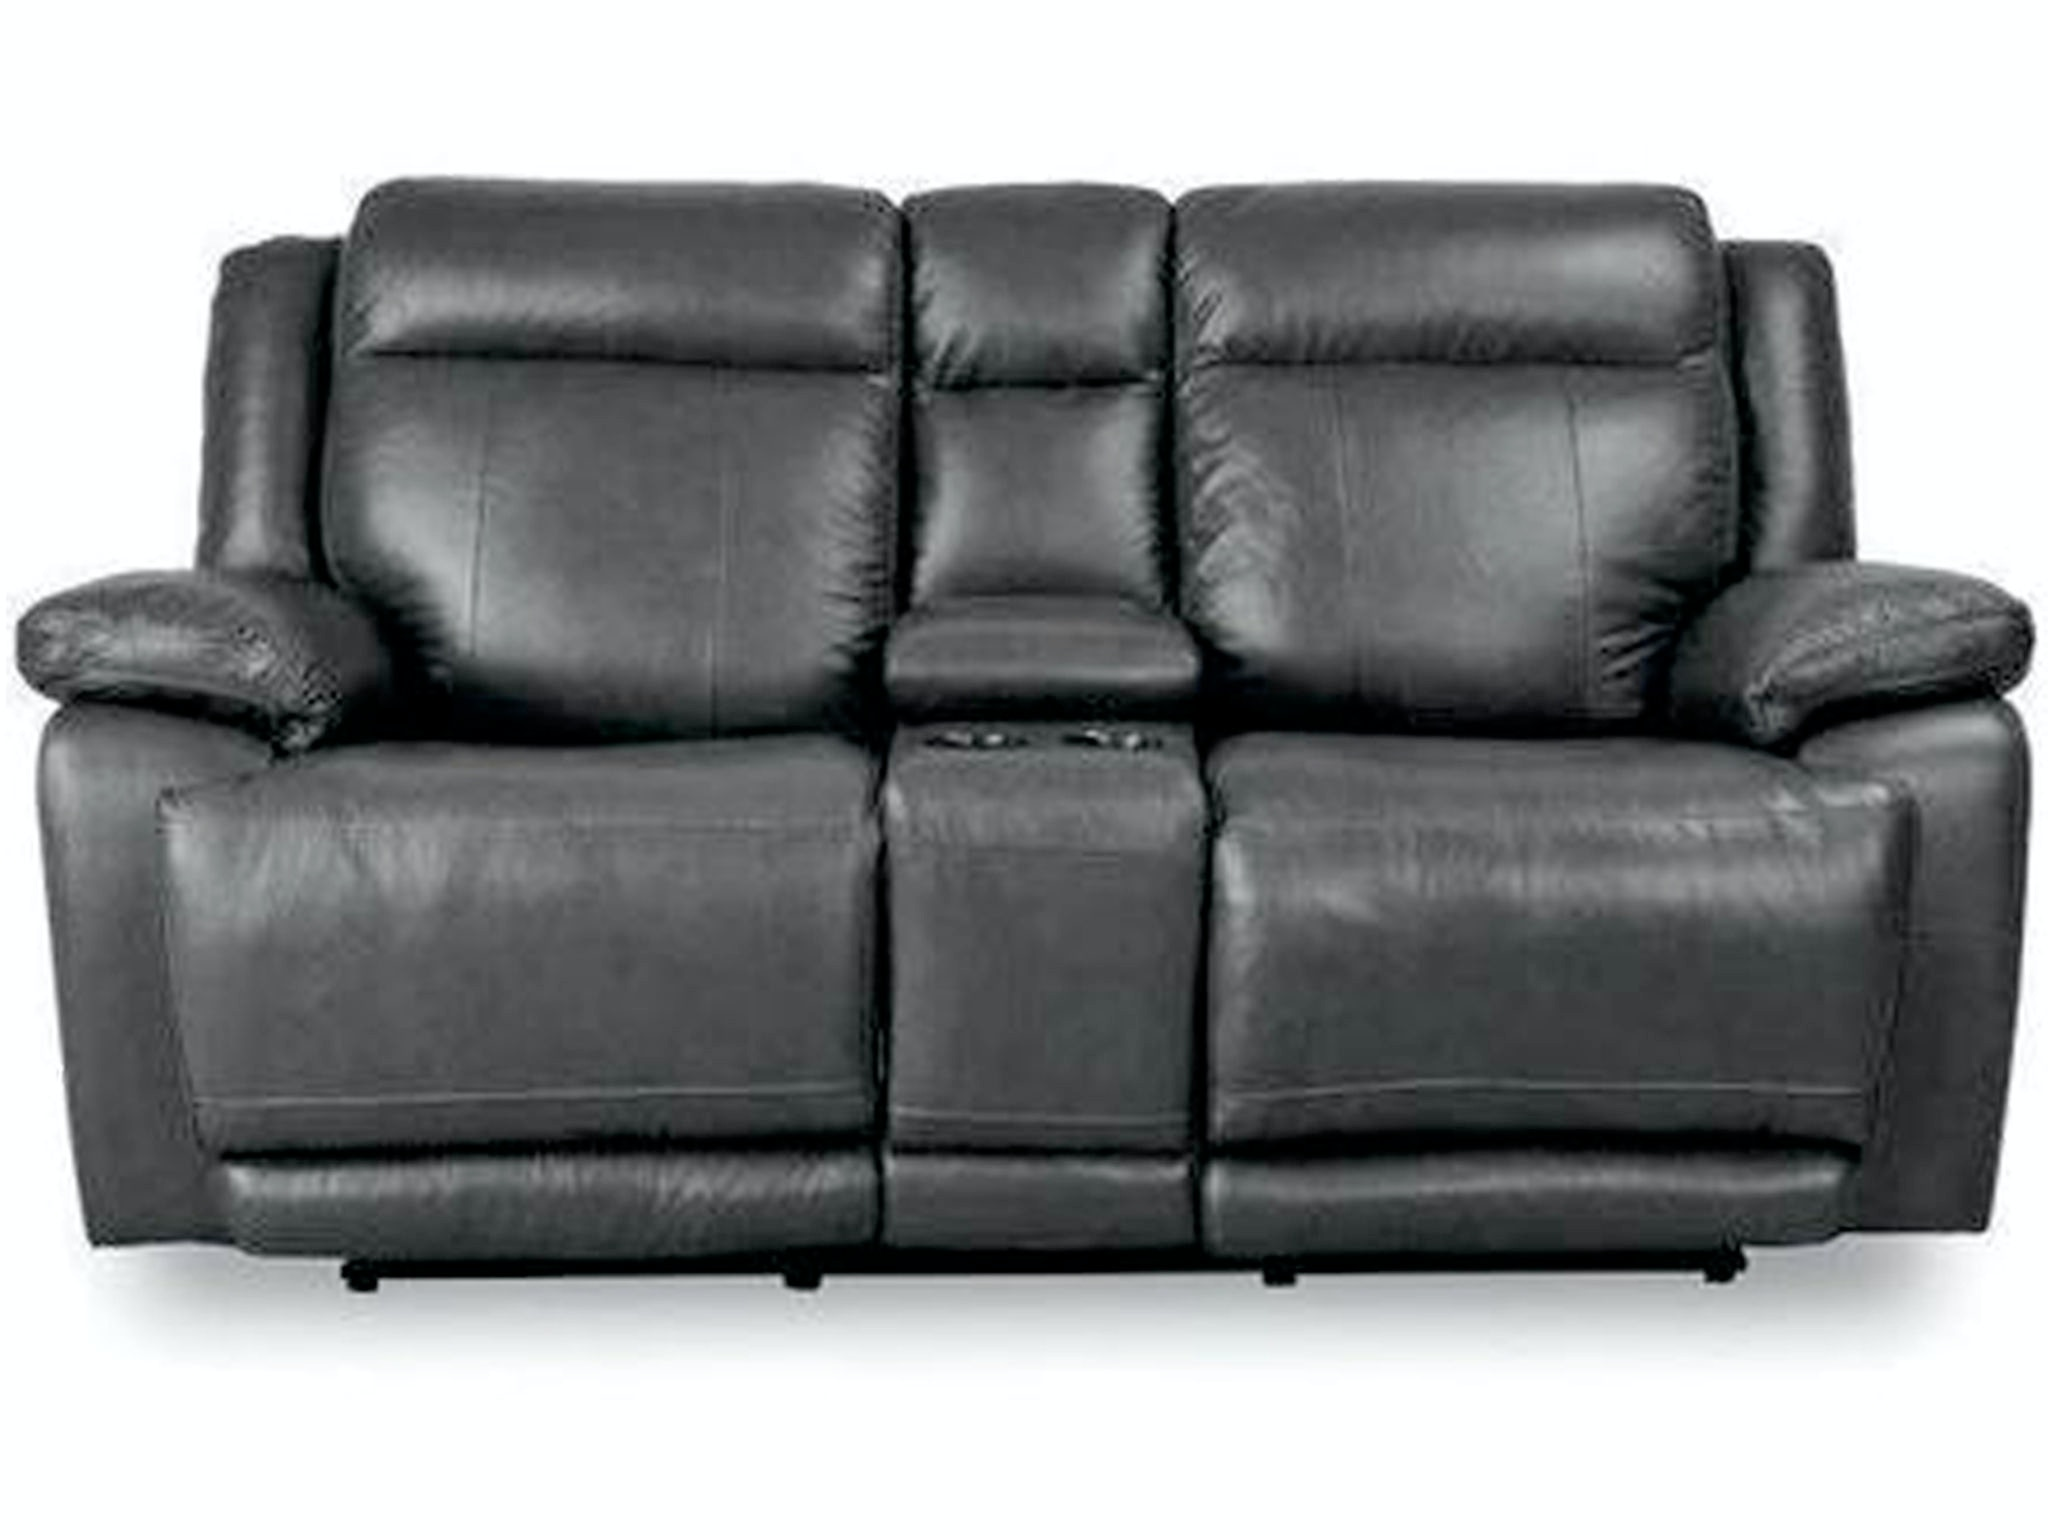 ... Gustafson Furniture Rockford By Bassett Evo Loveseat W Power Amp  Console 3706 Pc42g ...